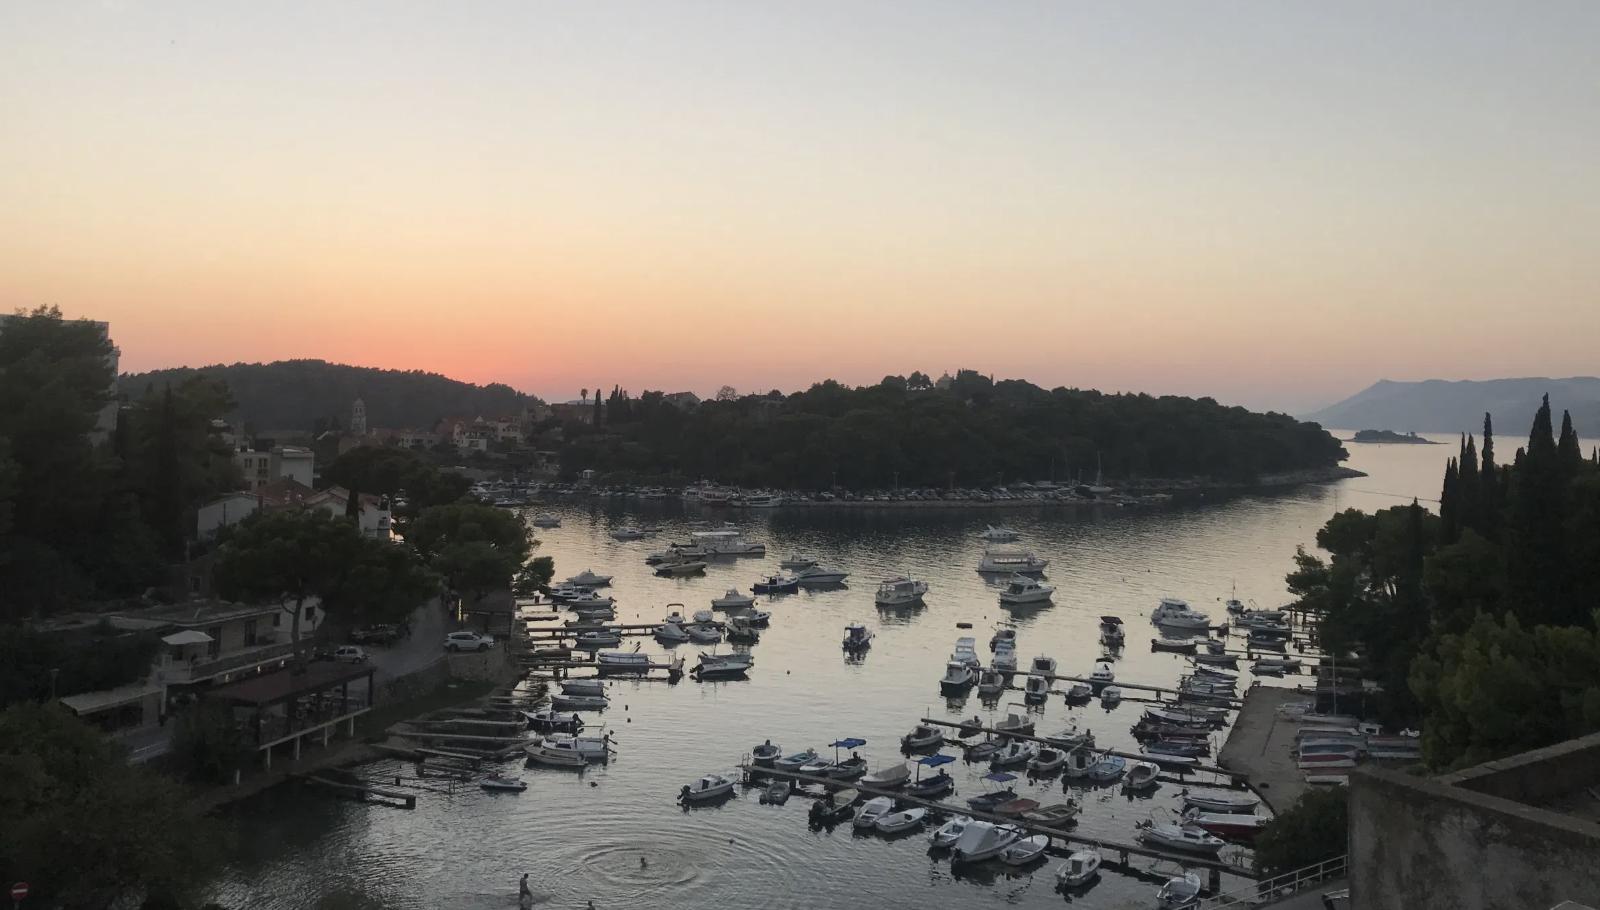 Sunset in Cavtat, Croatia